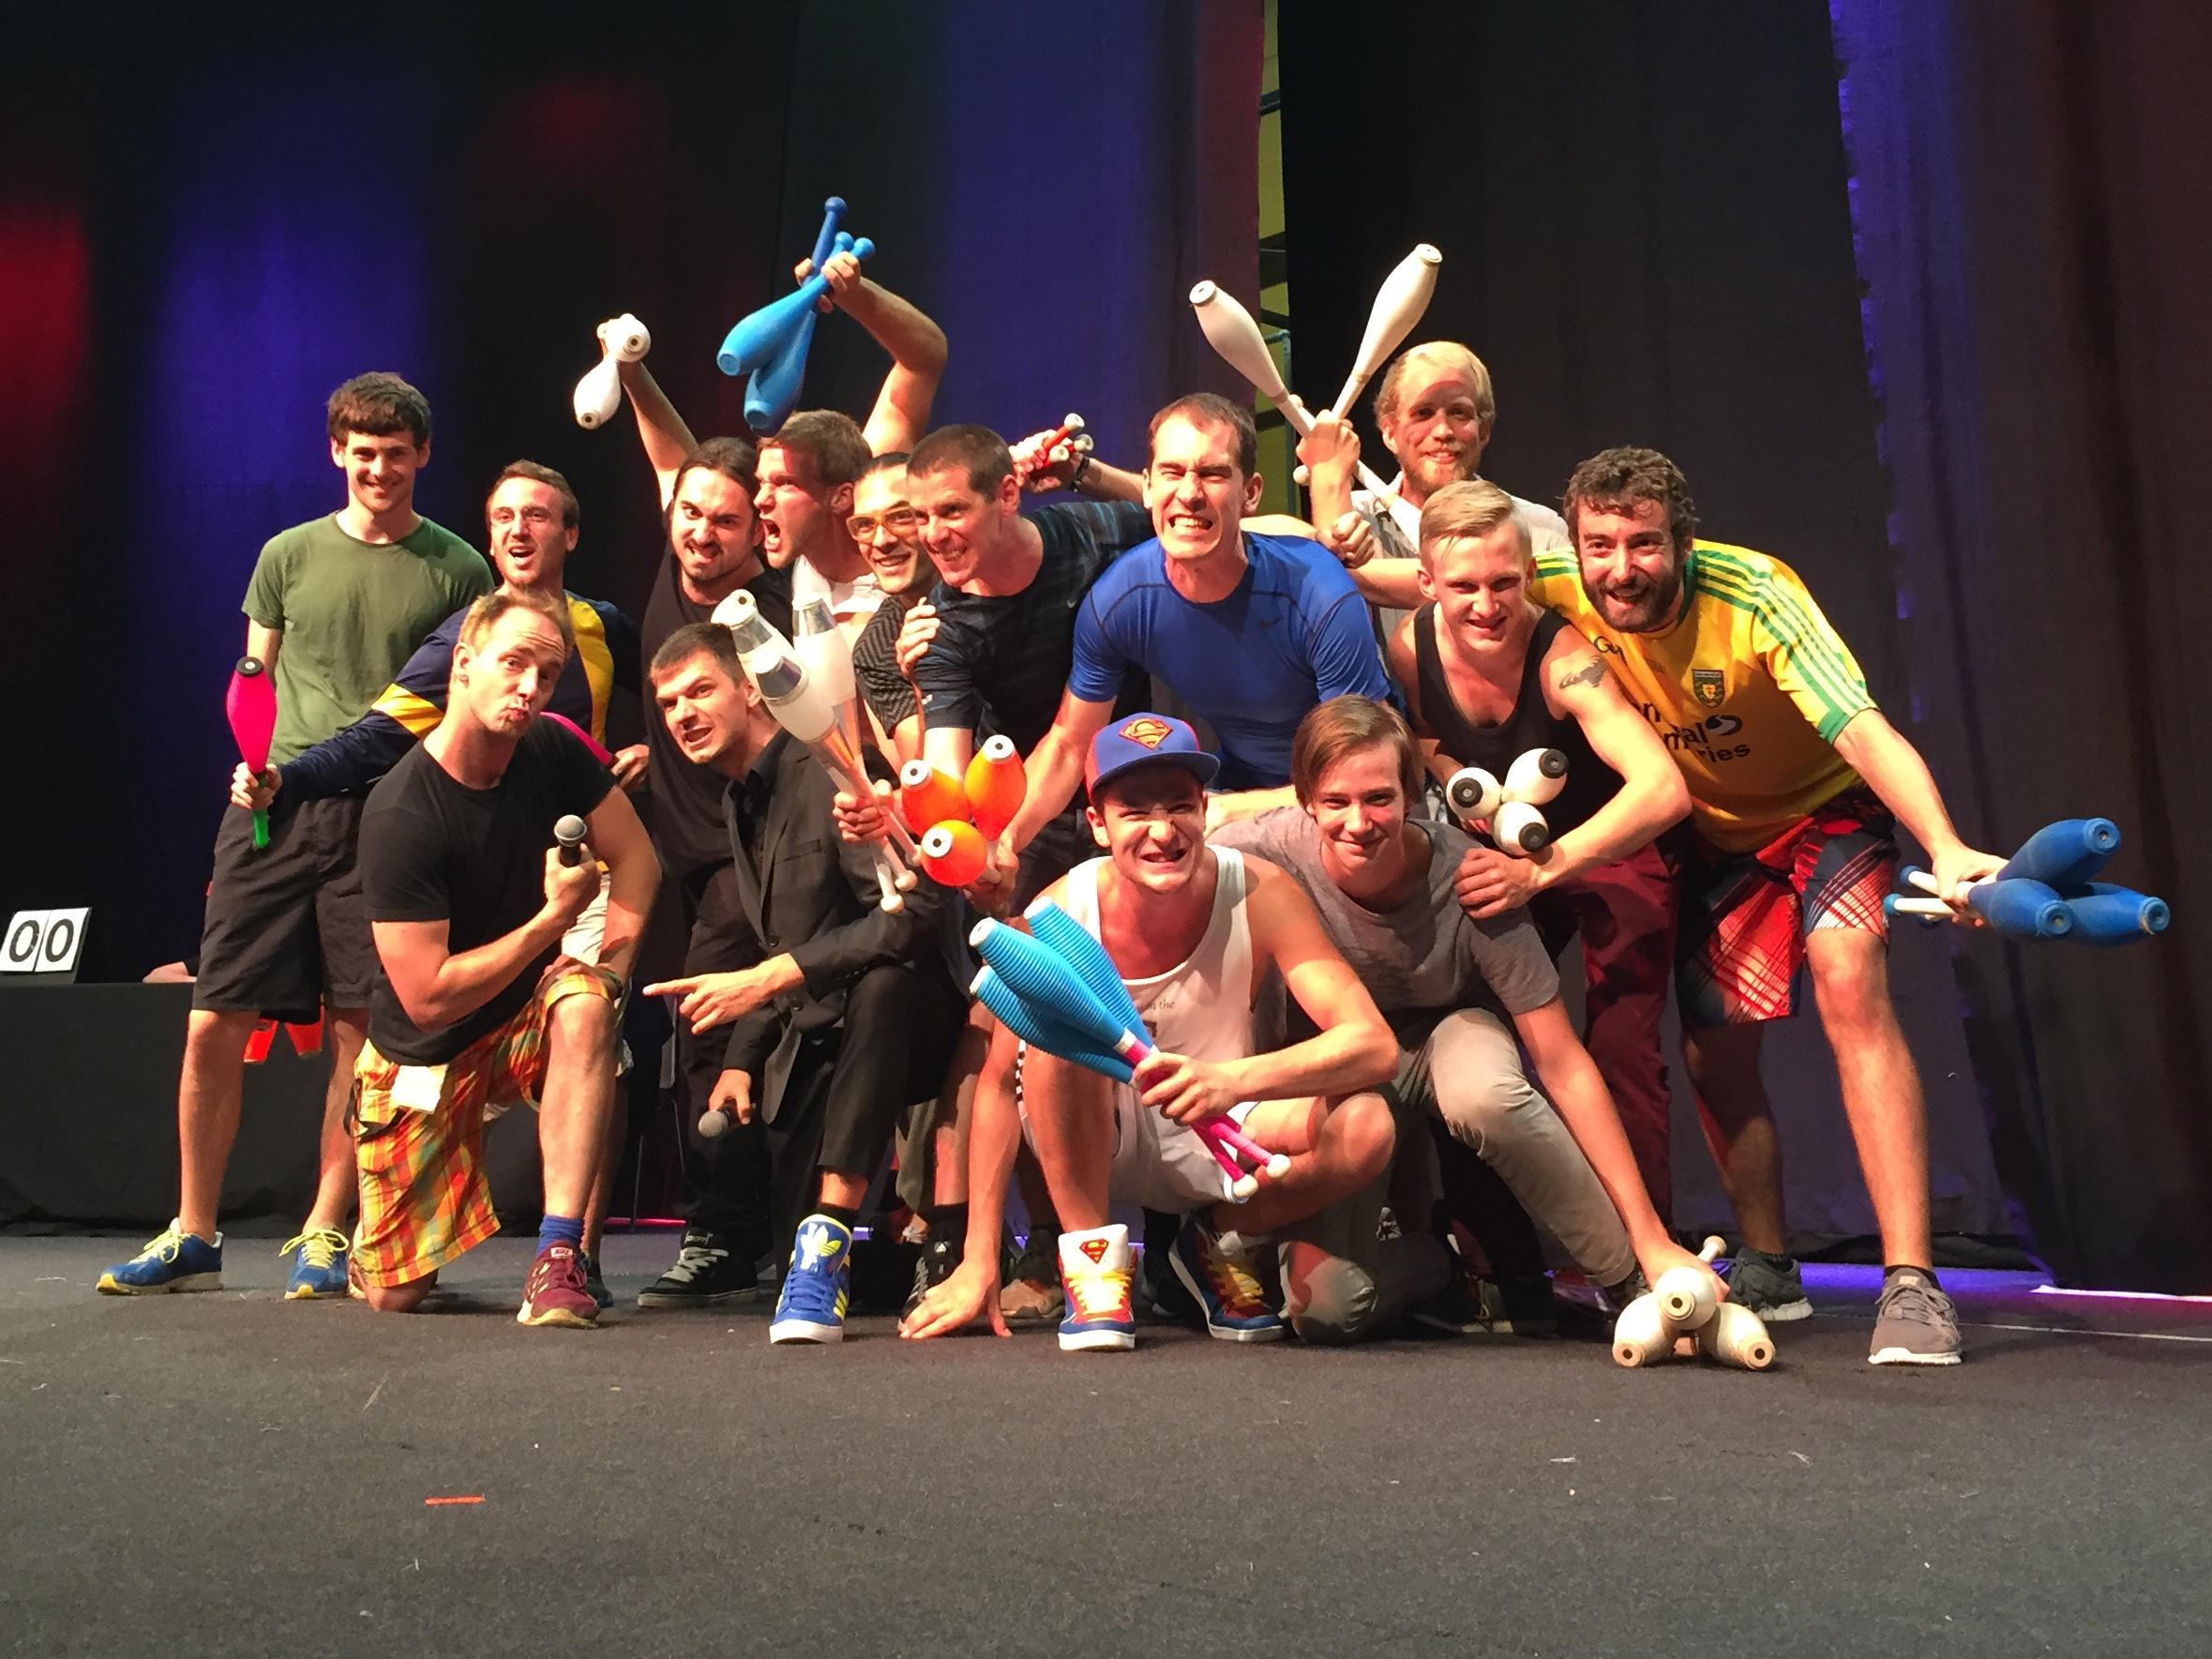 EJC 2015 Bruneck - Wednesday August 5th: Fight Night.